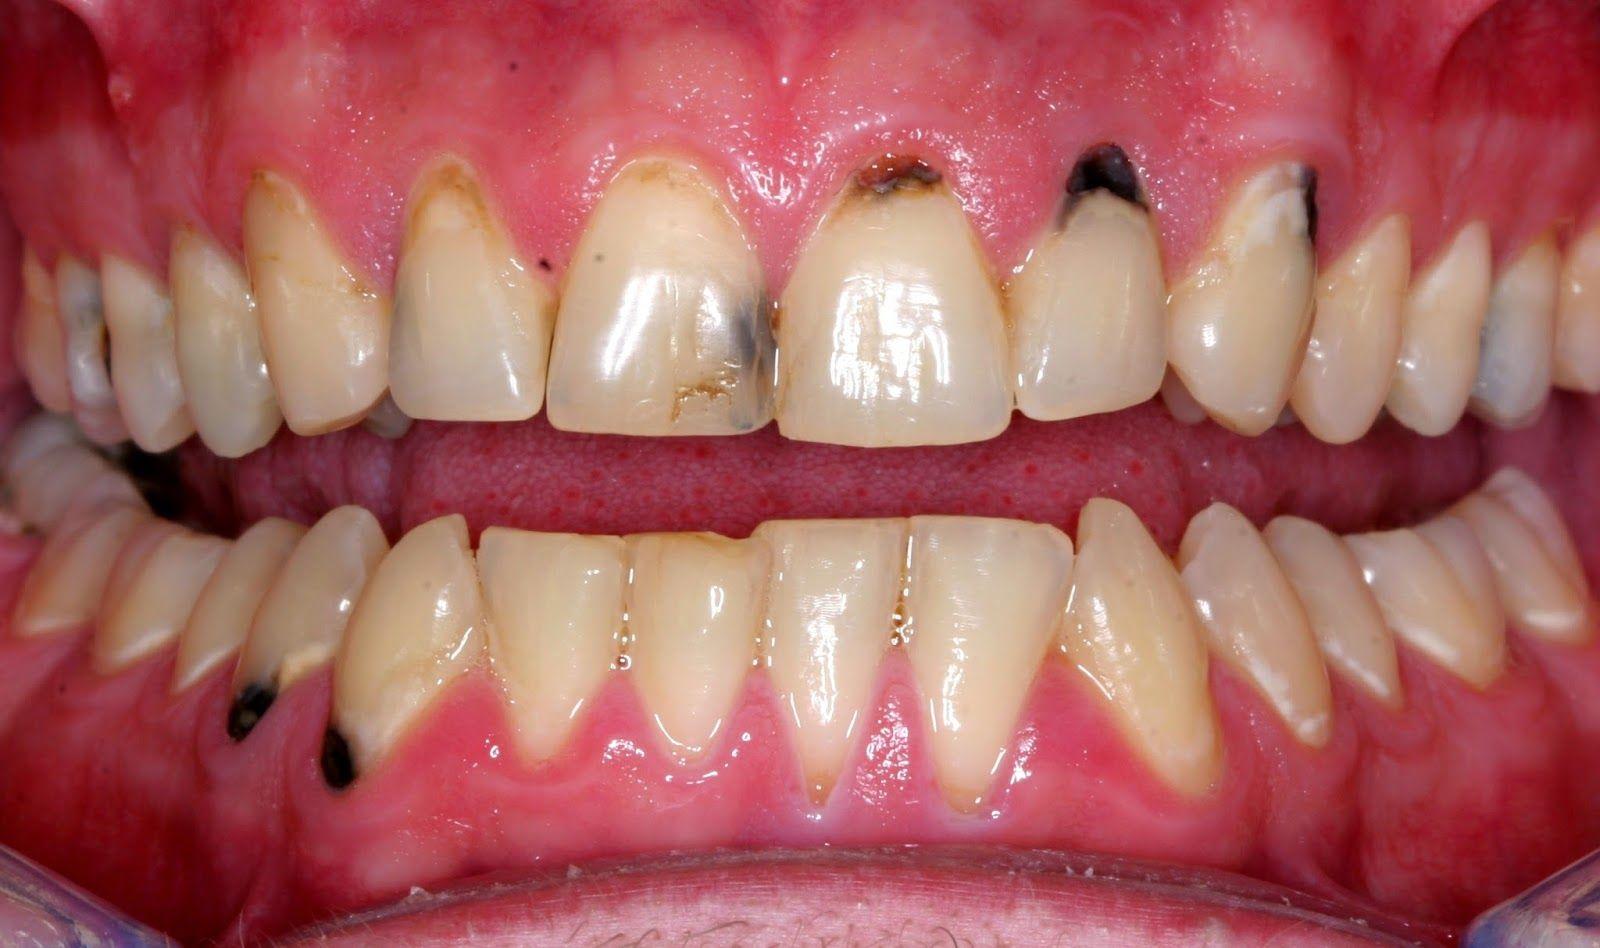 Pin On Teeth Cavities Remedies